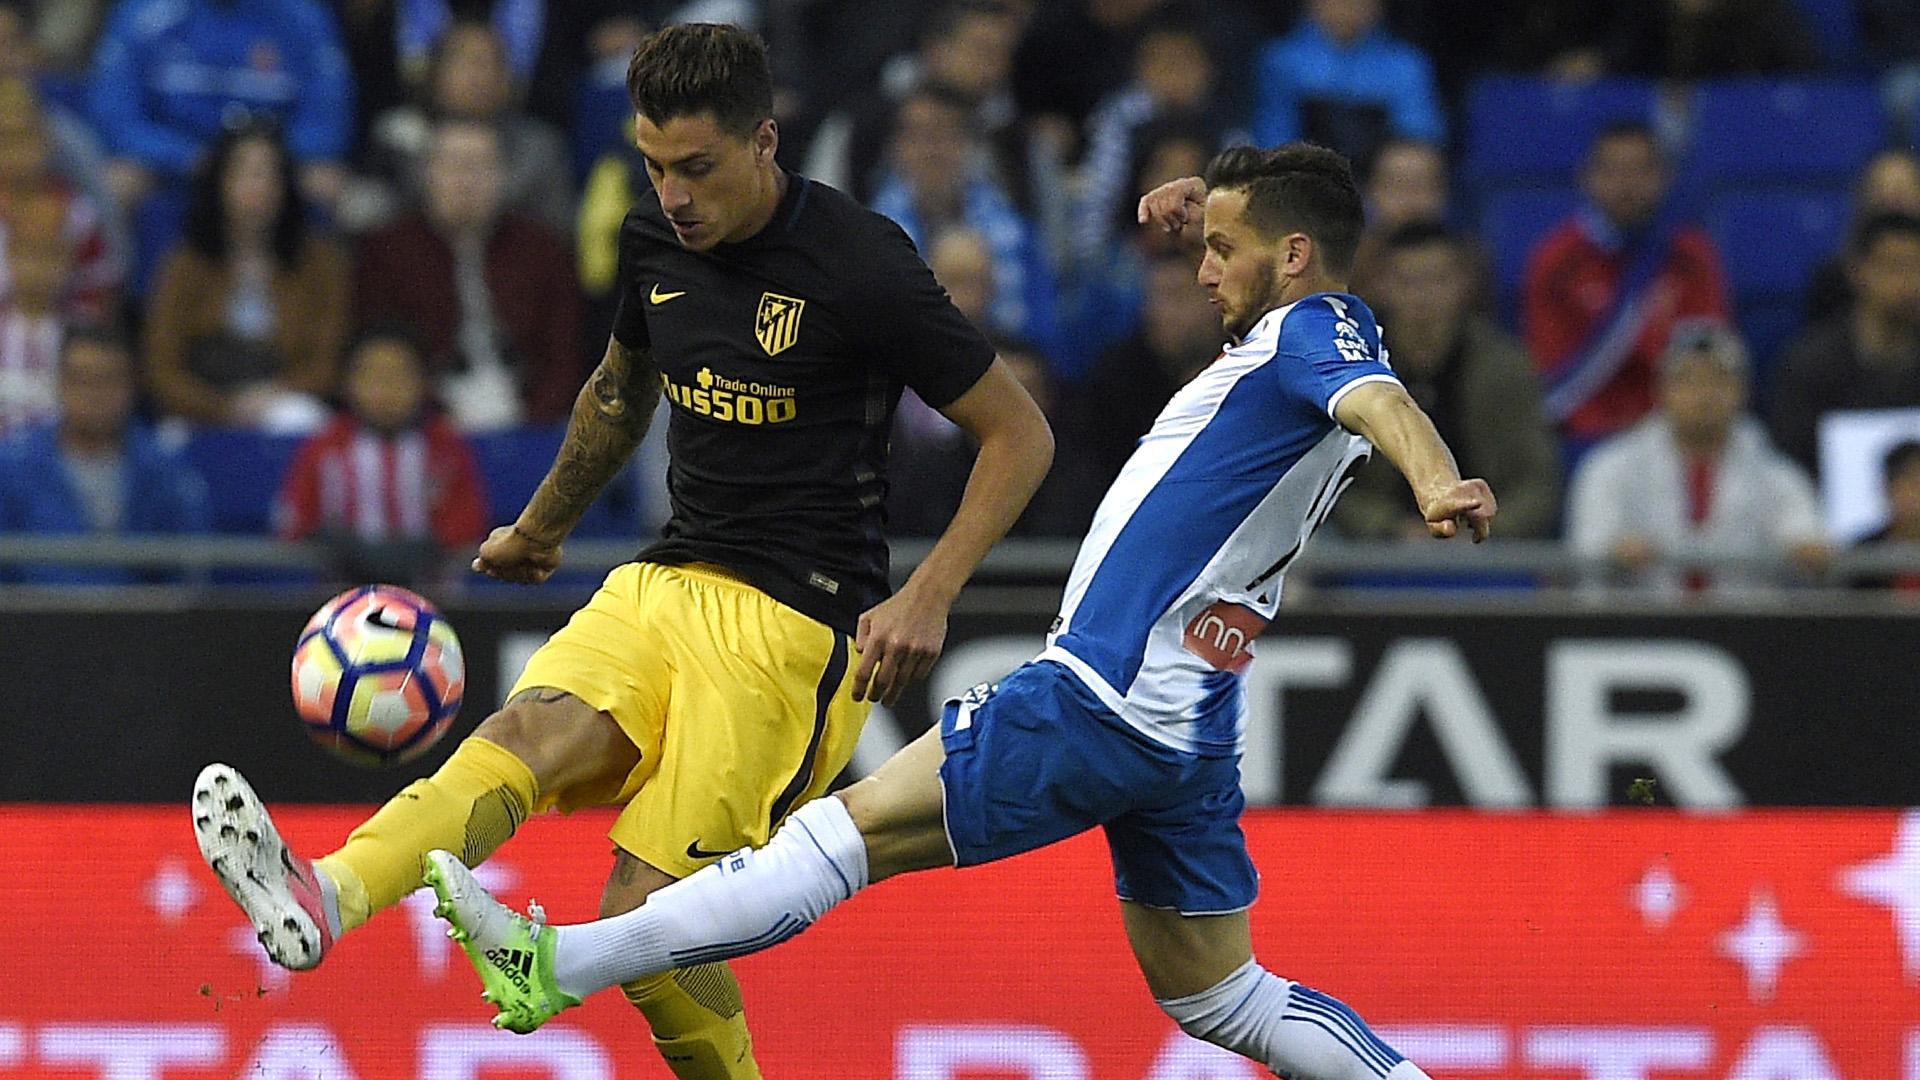 atletico madrid espanyol barcelona primera division 042217